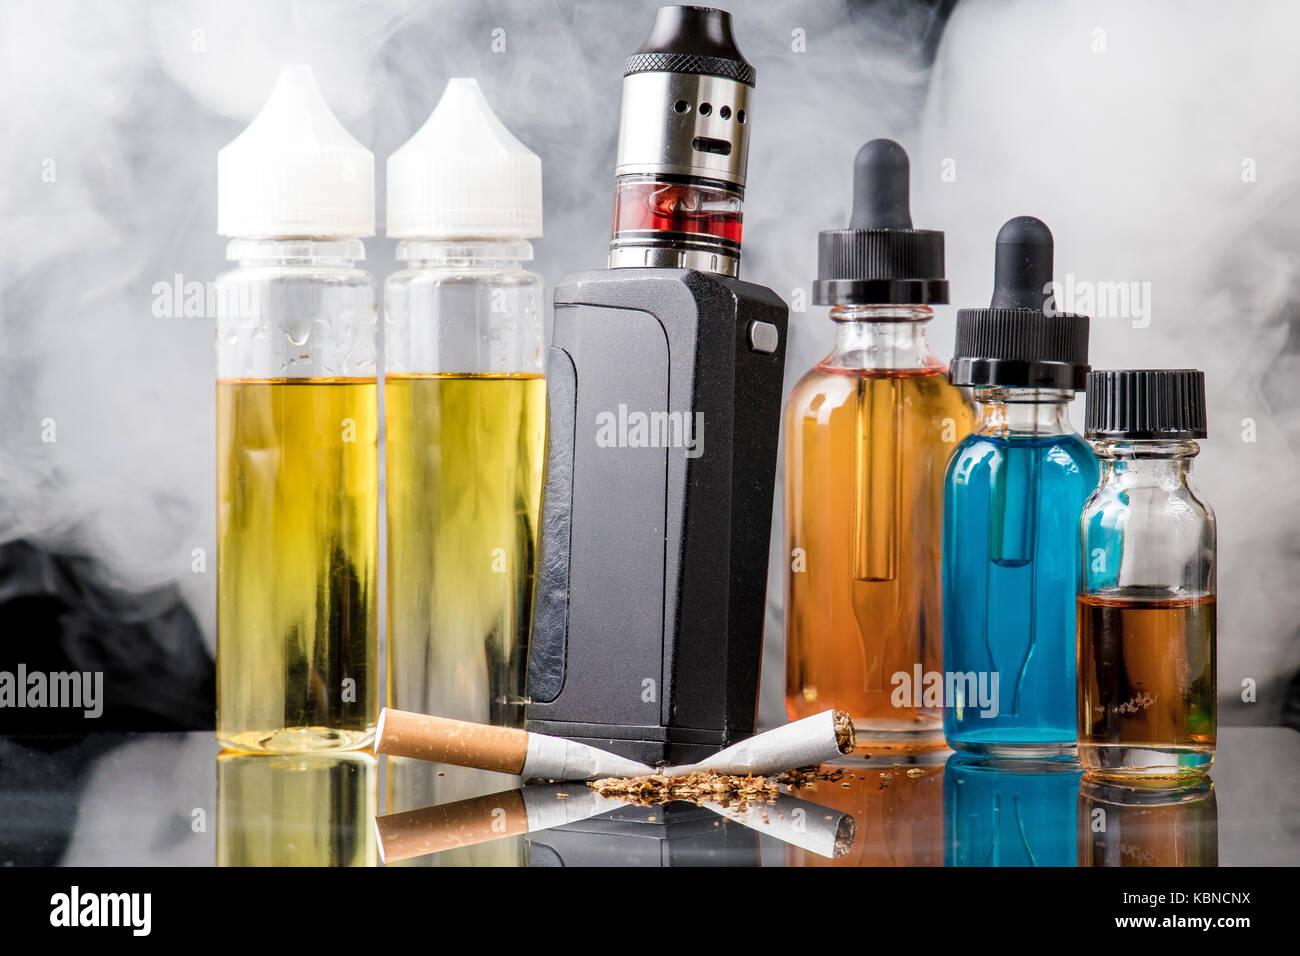 Modern vaporiser versus old tobacco cigarette in smoke cloud Stock Photo